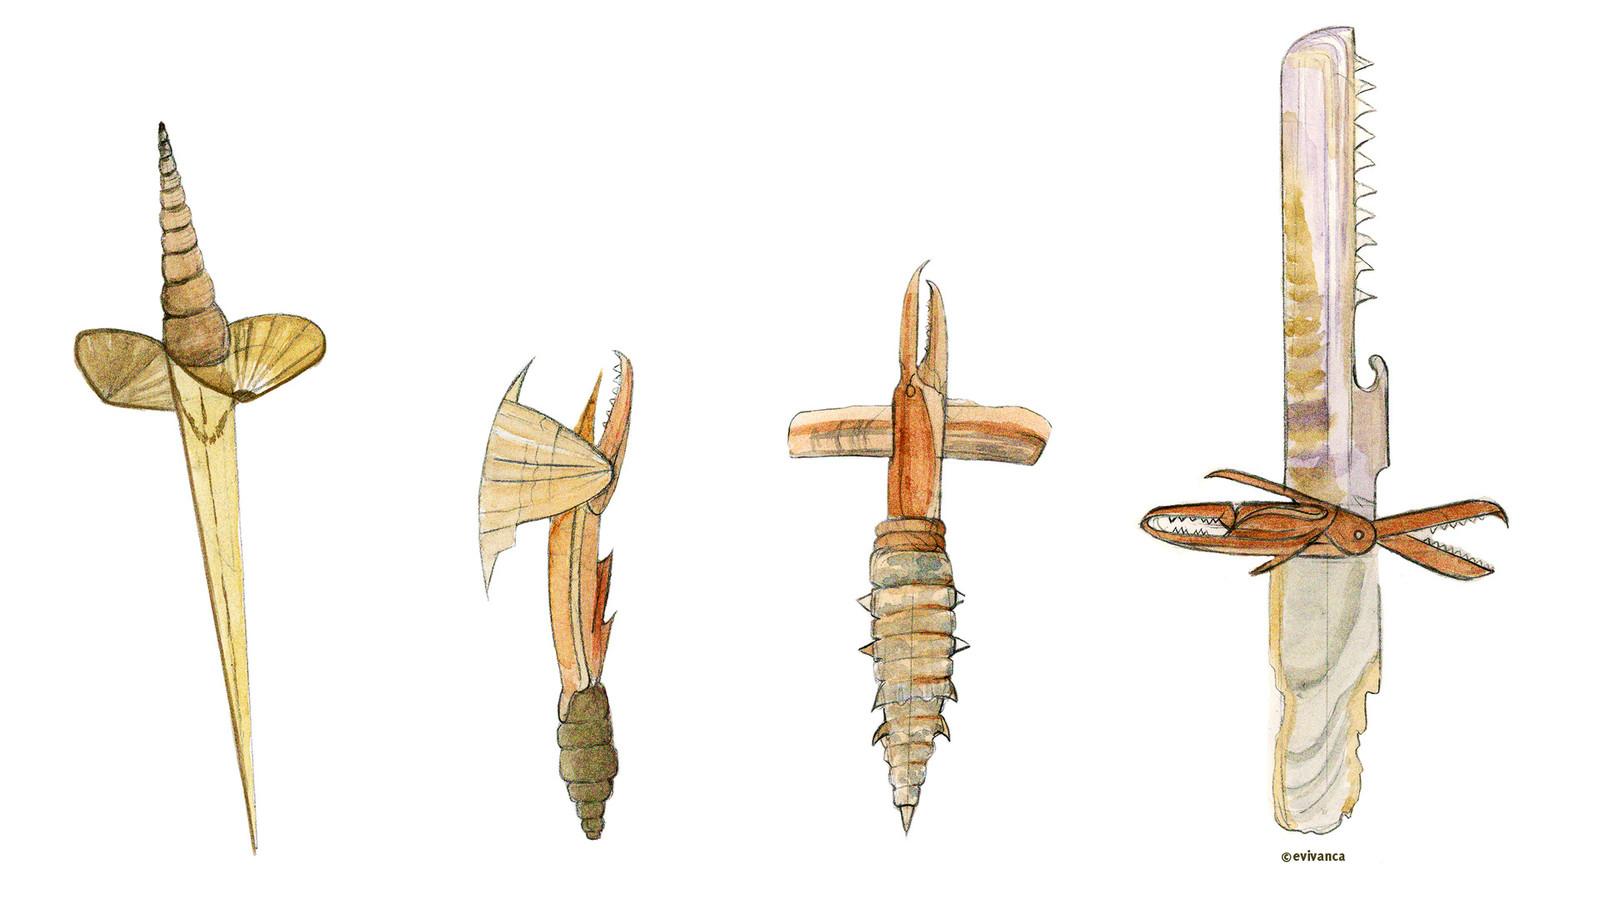 4 handweapons made of shells